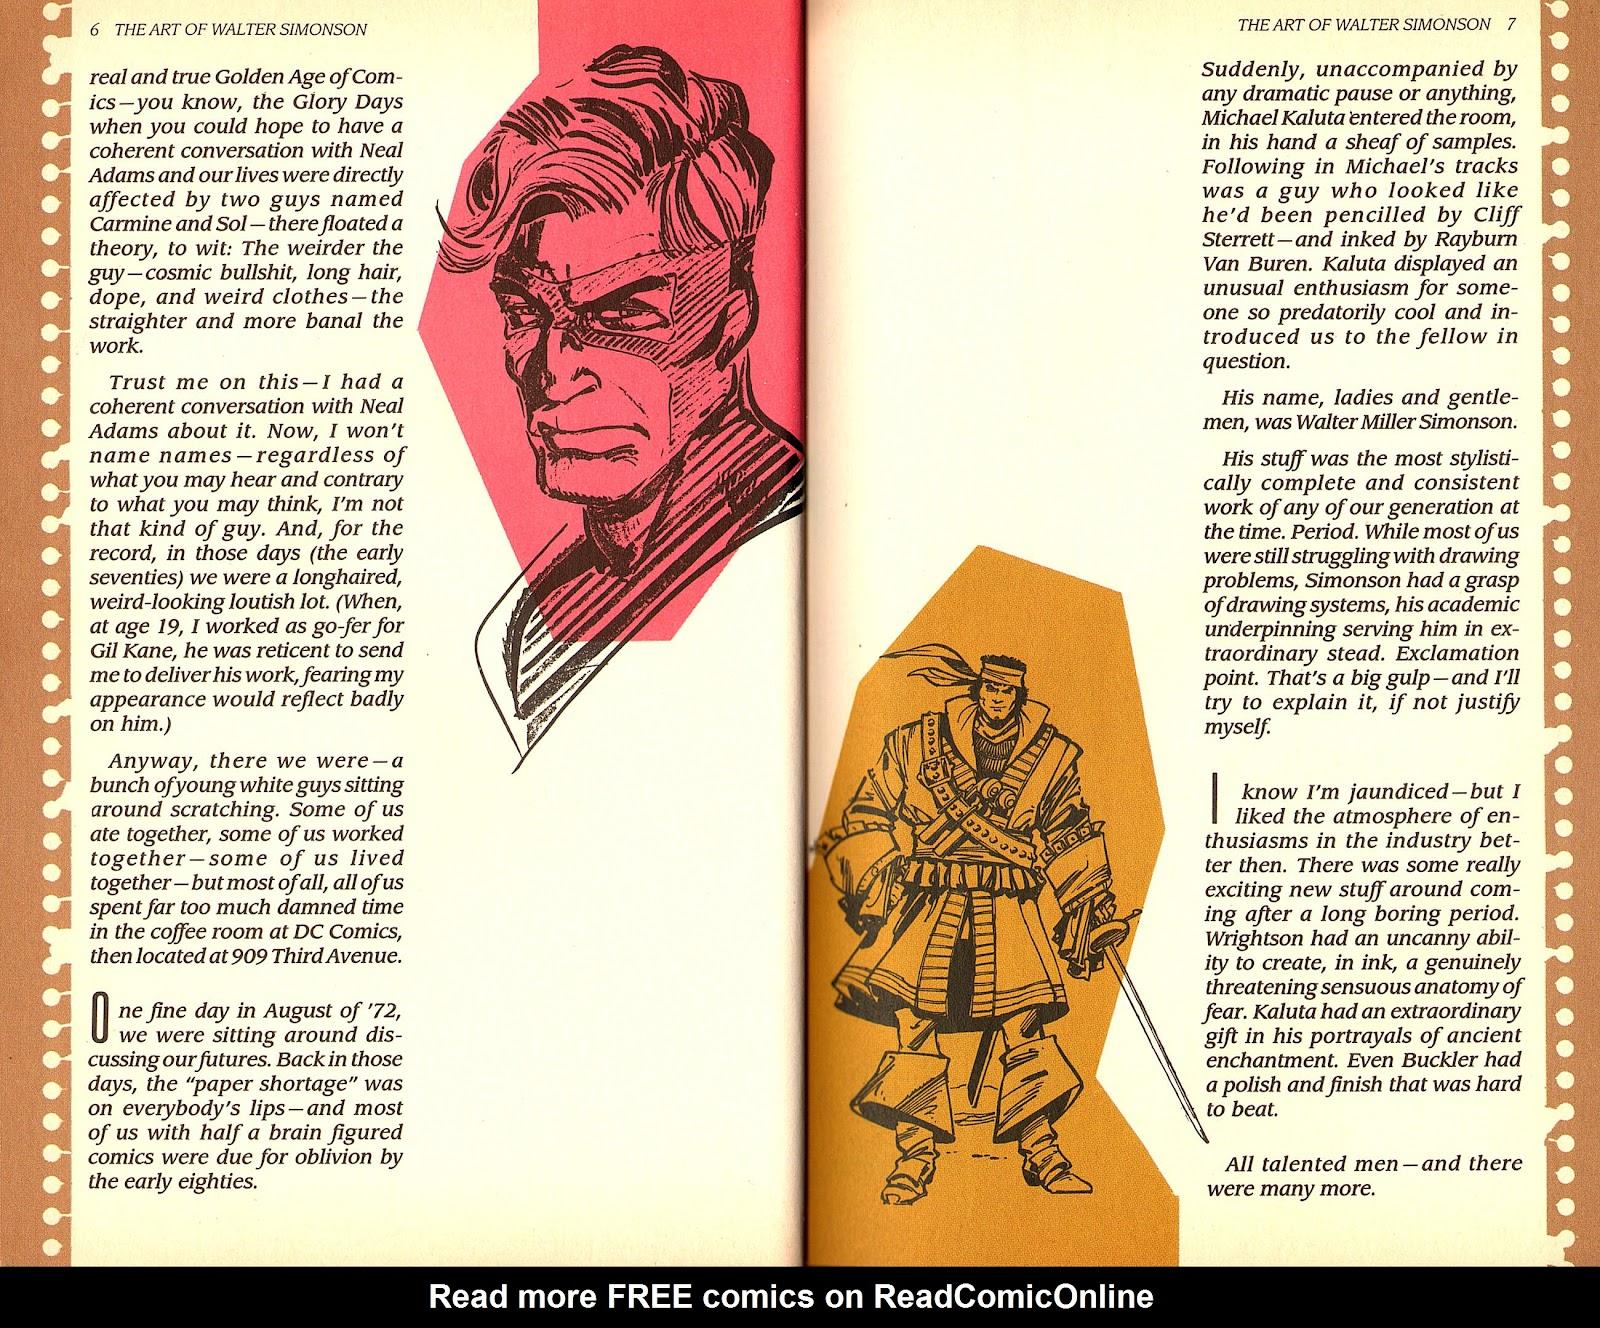 Read online The Art of Walter Simonson comic -  Issue # TPB - 5